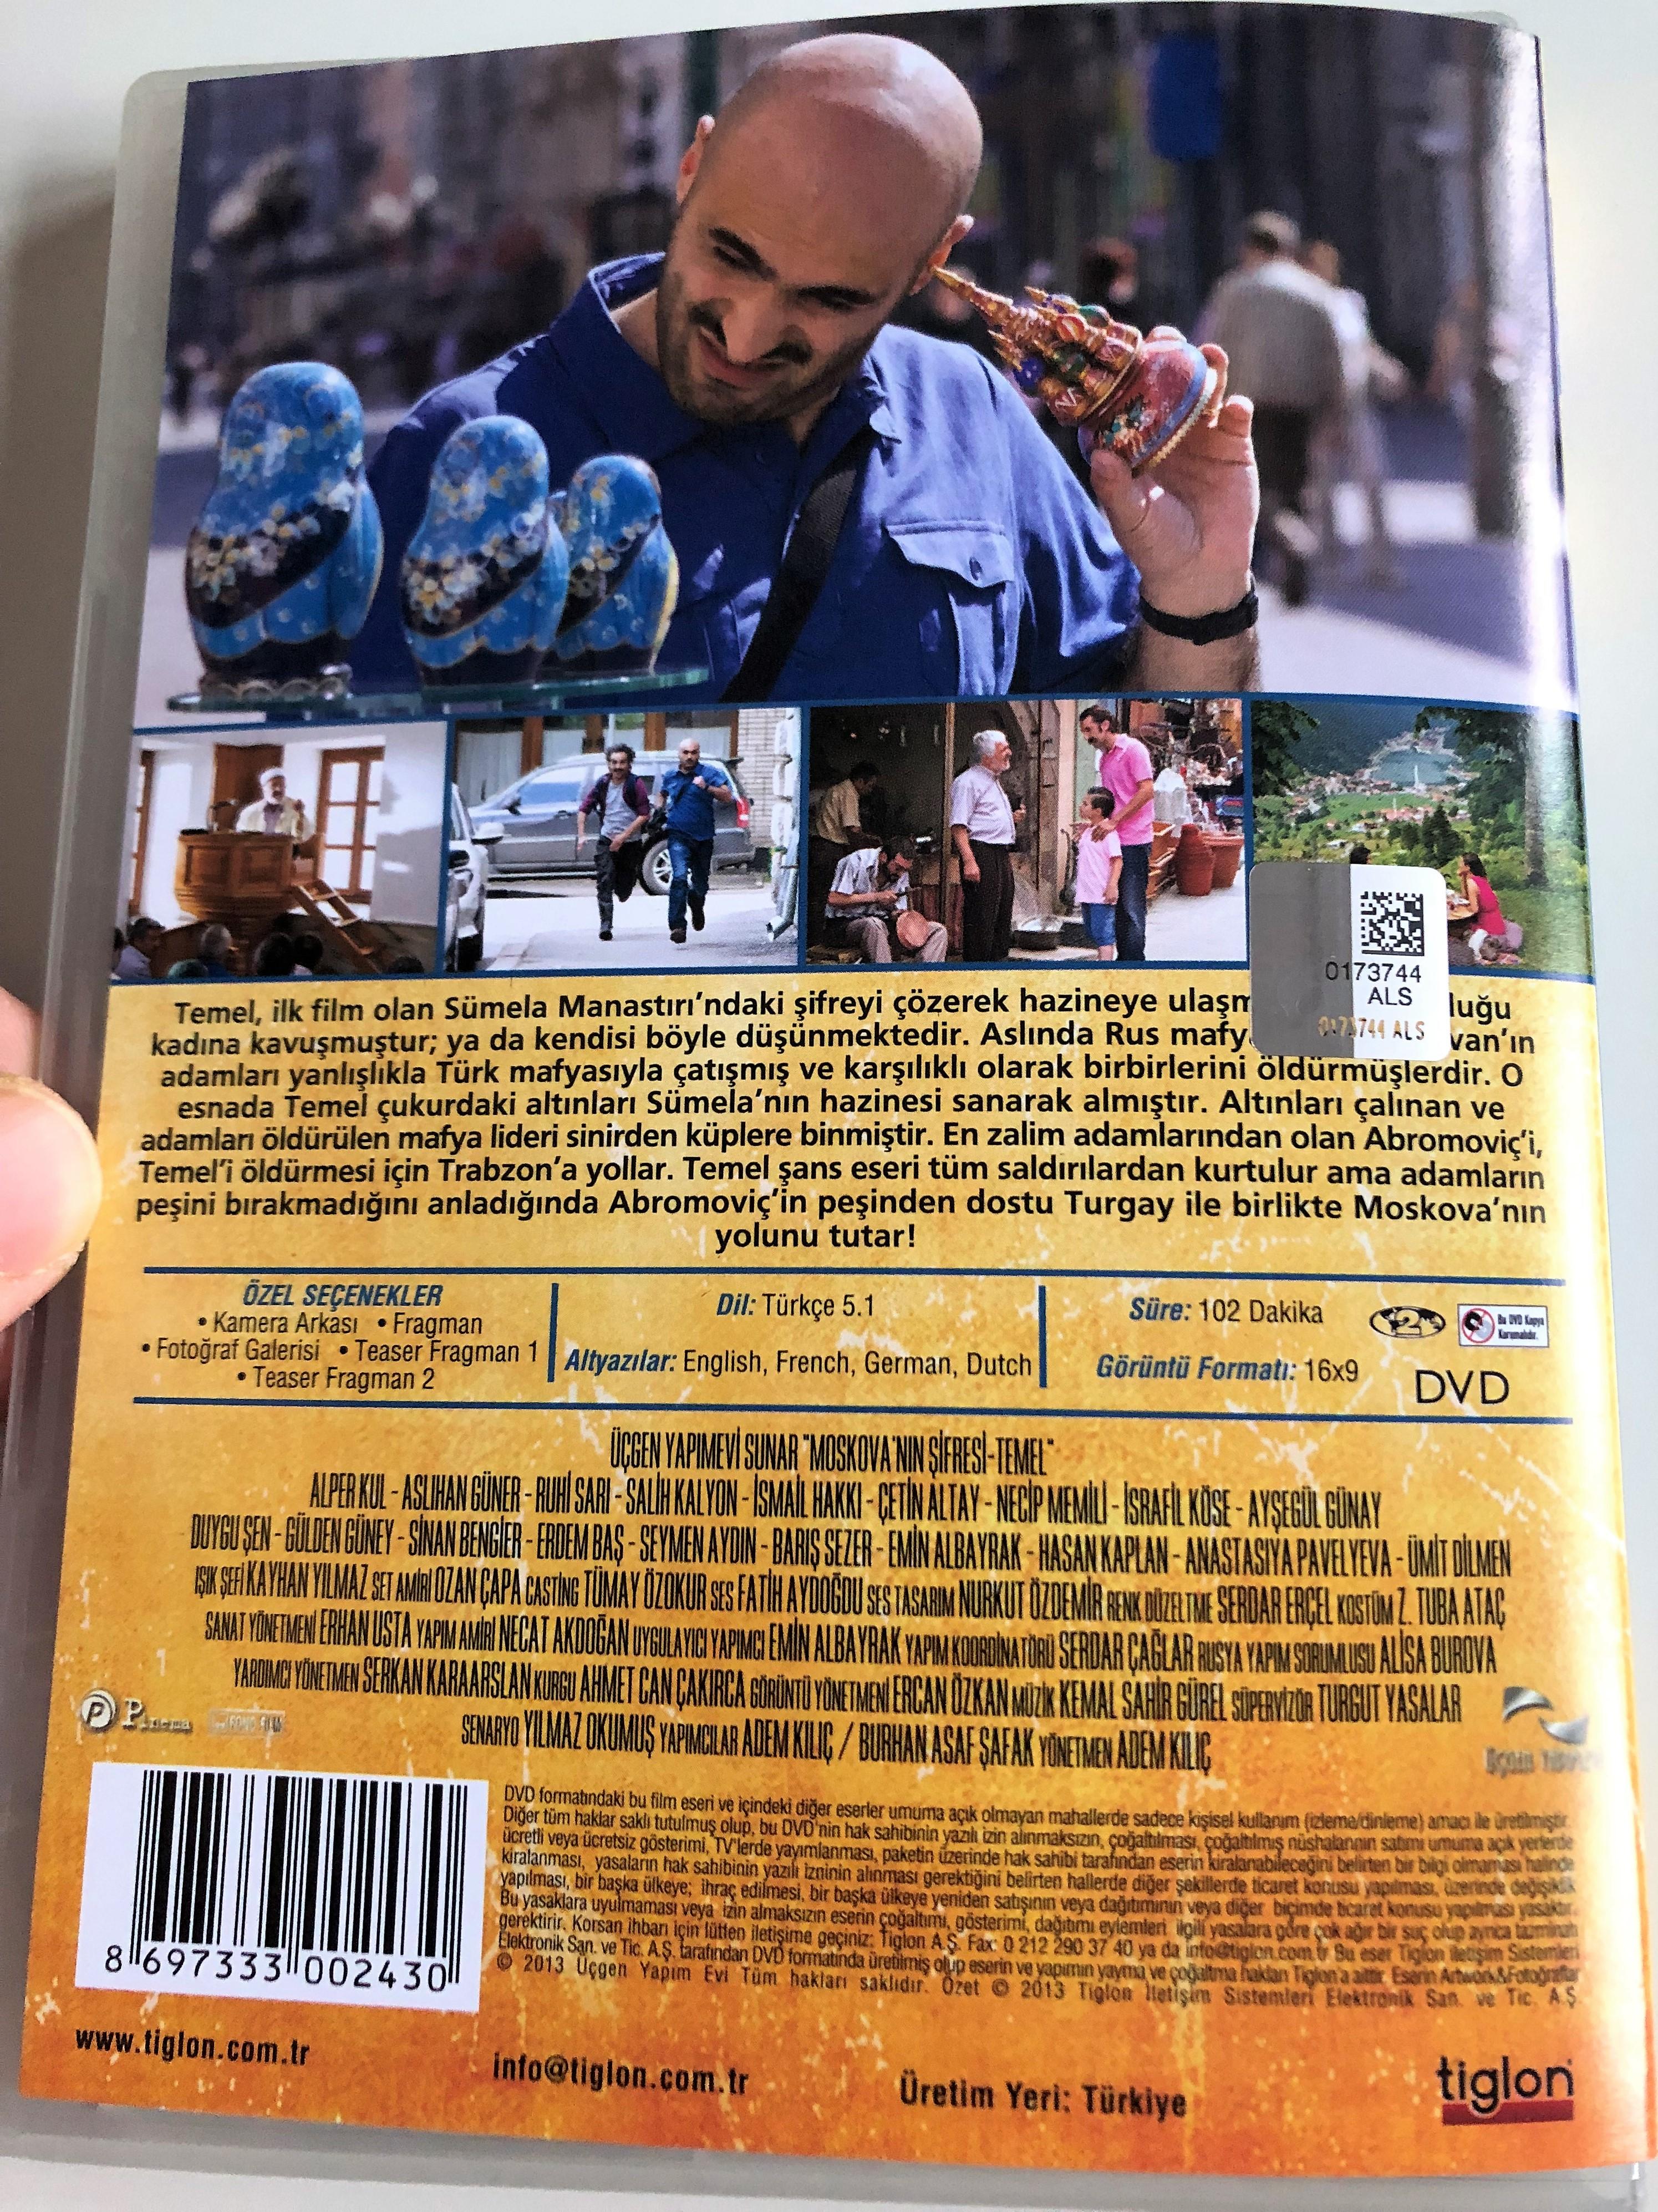 moskova-n-n-ifresi-temel-dvd-2012-moscow-code-directed-by-adem-kili-starring-alper-kul-asl-han-g-ner-ruhi-sar-salih-kalyon-2-.jpg